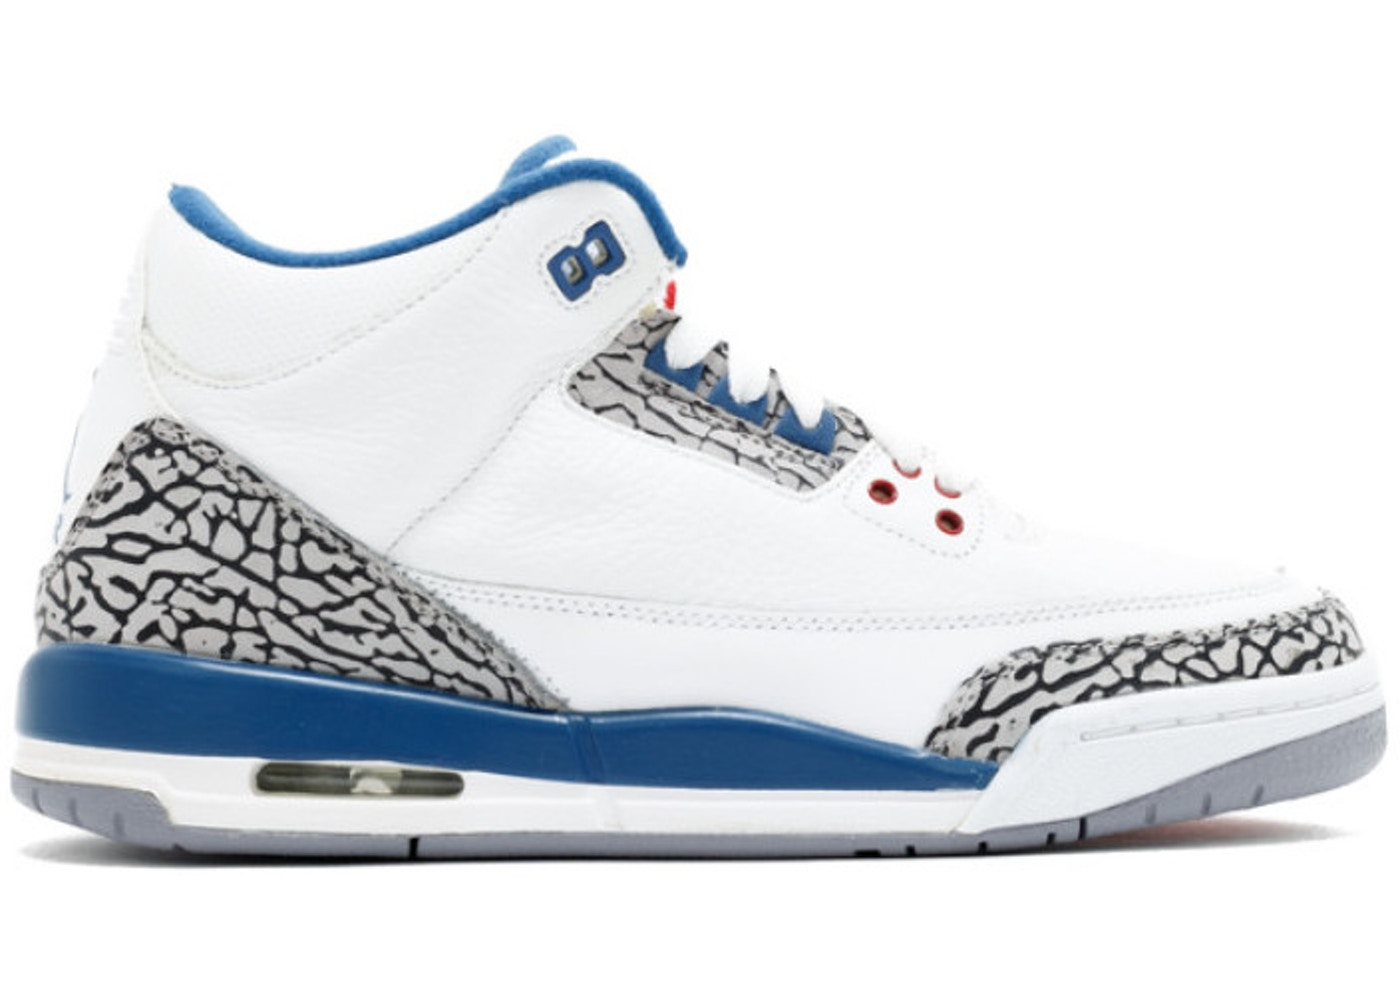 76171bdf77c7 Jordan 3 Retro True Blue 2011 (GS) - 398614-104